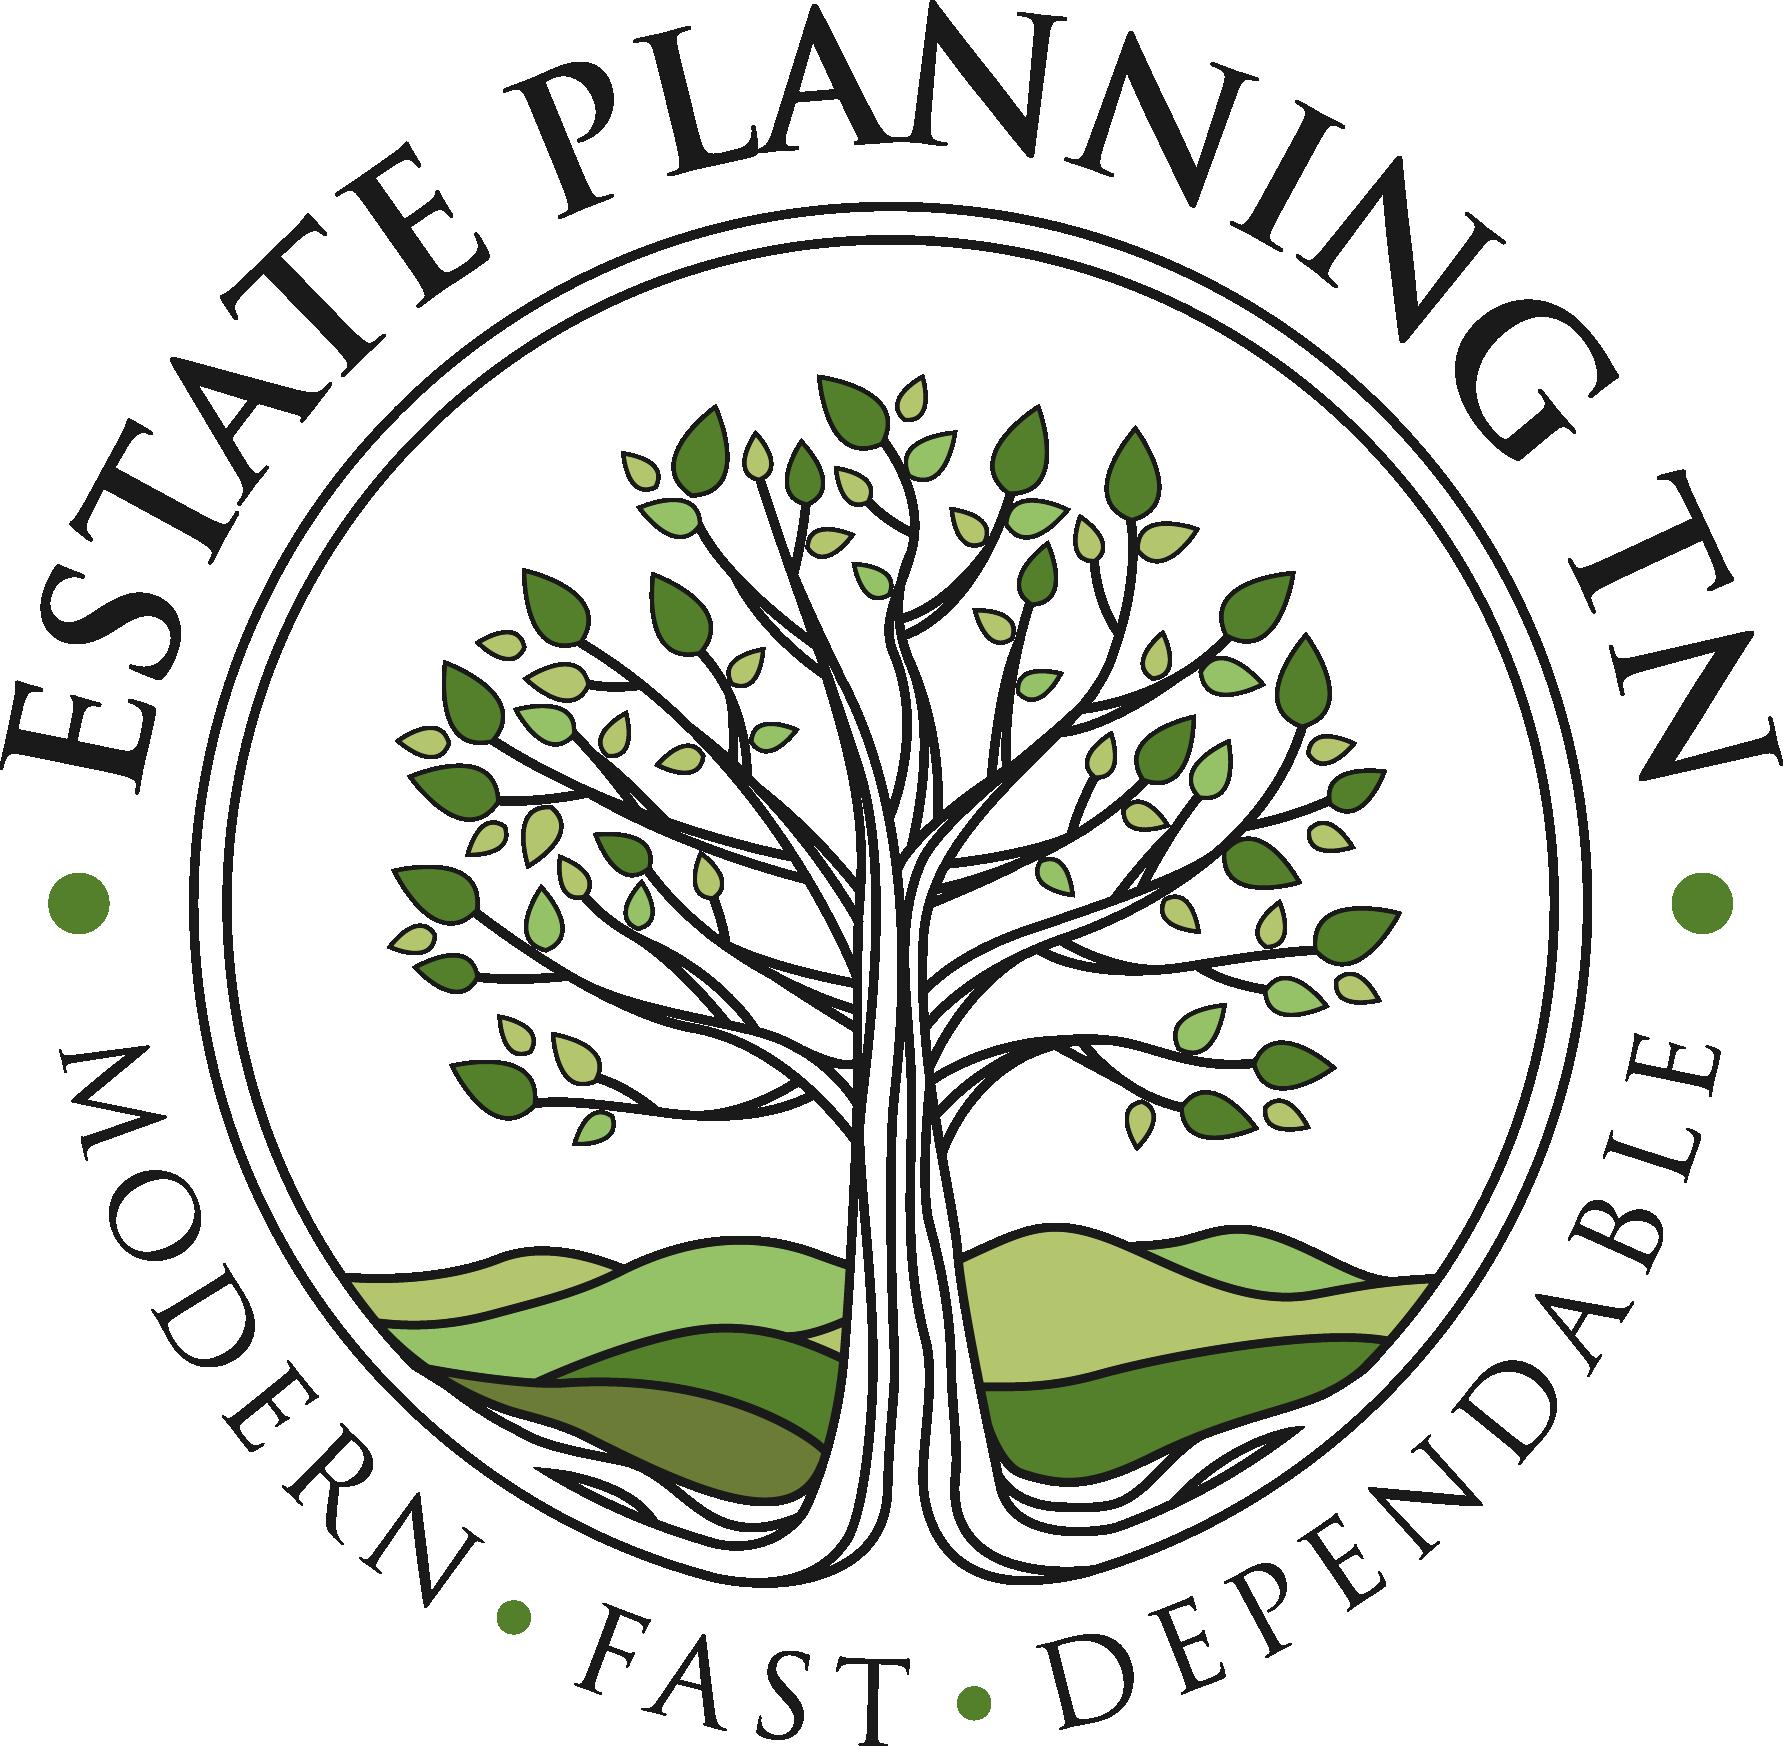 Visit My Estate Planning Website And Let Me Make The Process Convenient For You!www.estateplanningtn.com -